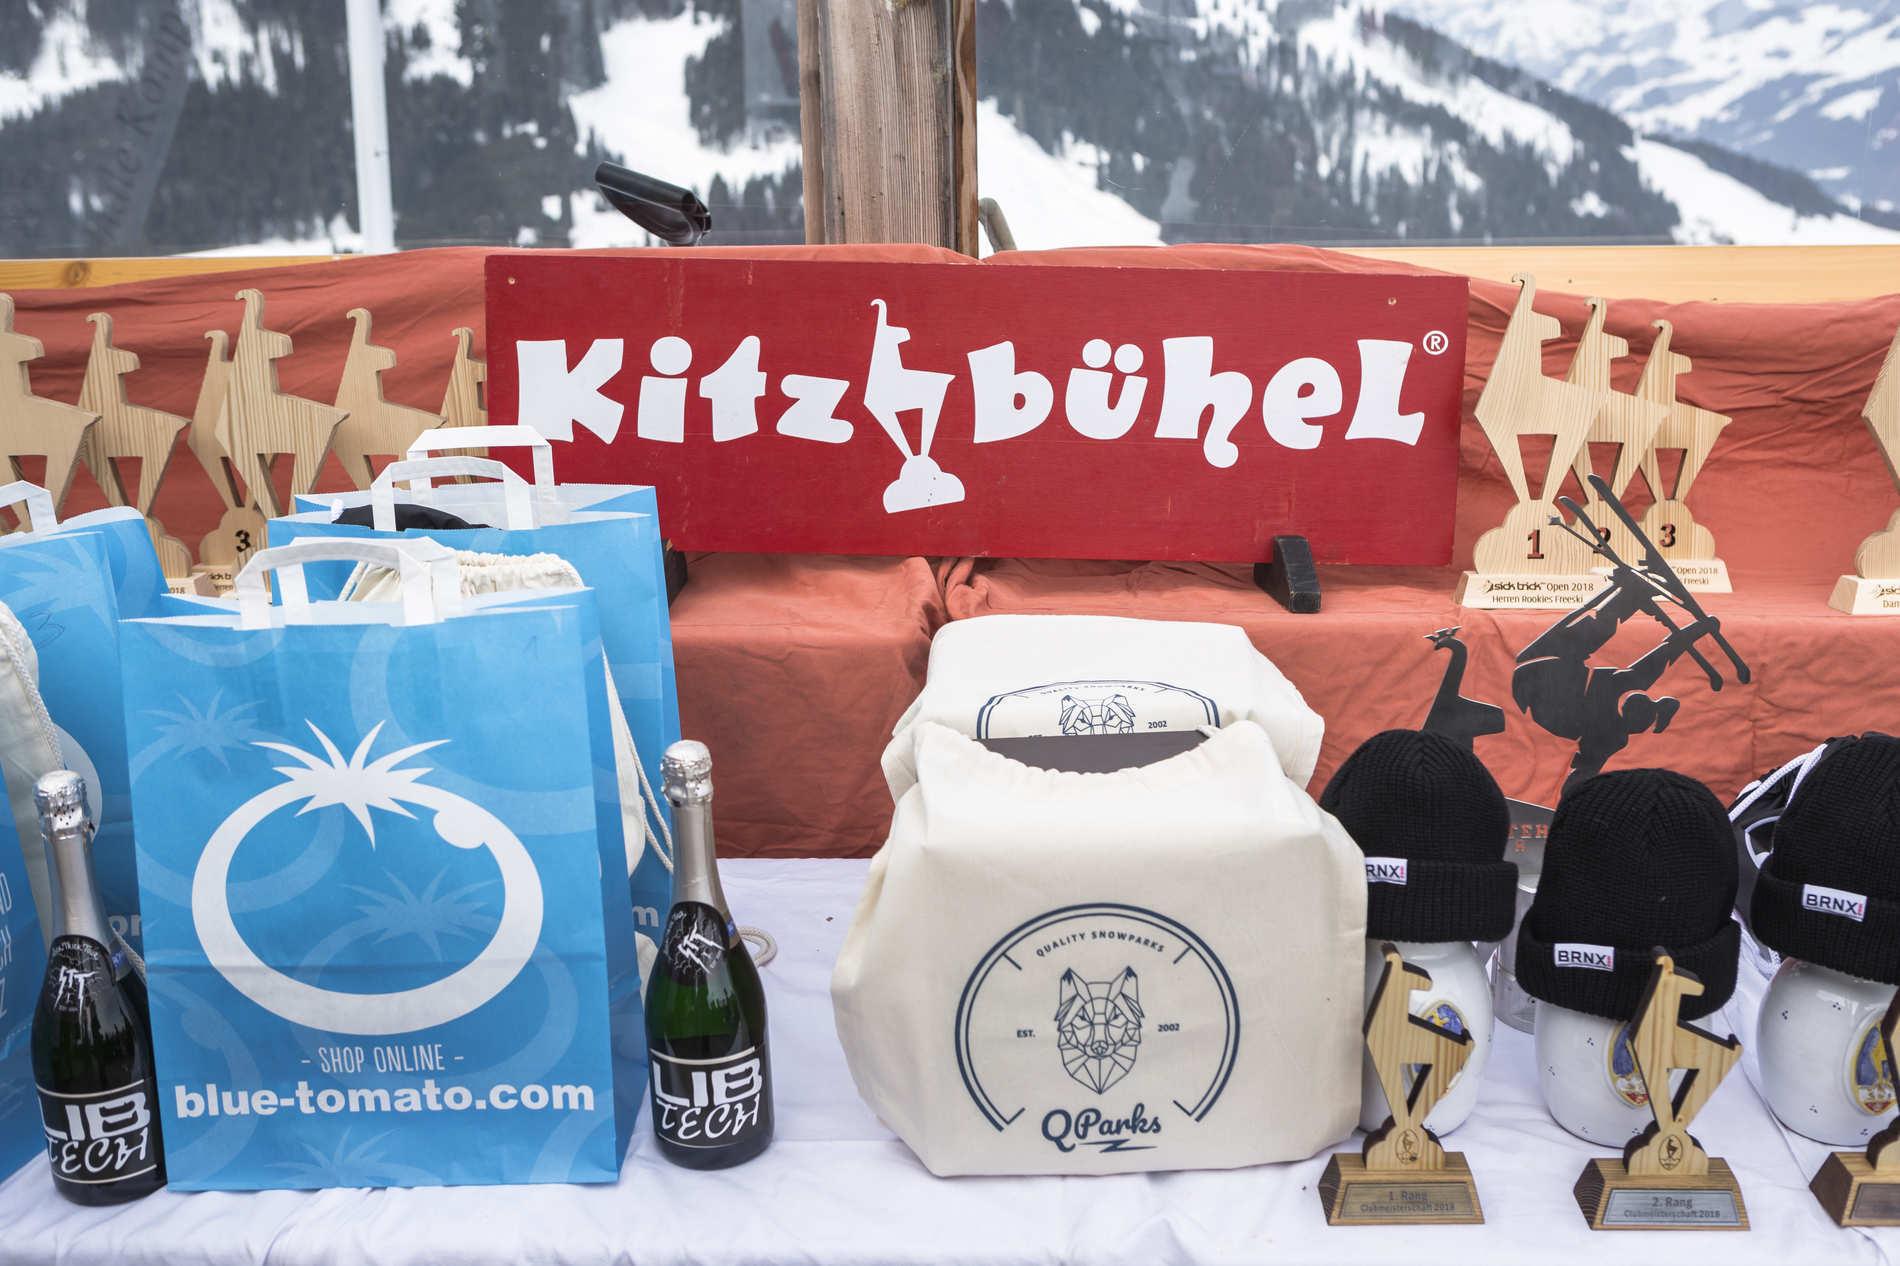 kitzbuehel 03 03 2018 scenic roland haschka qparks 013